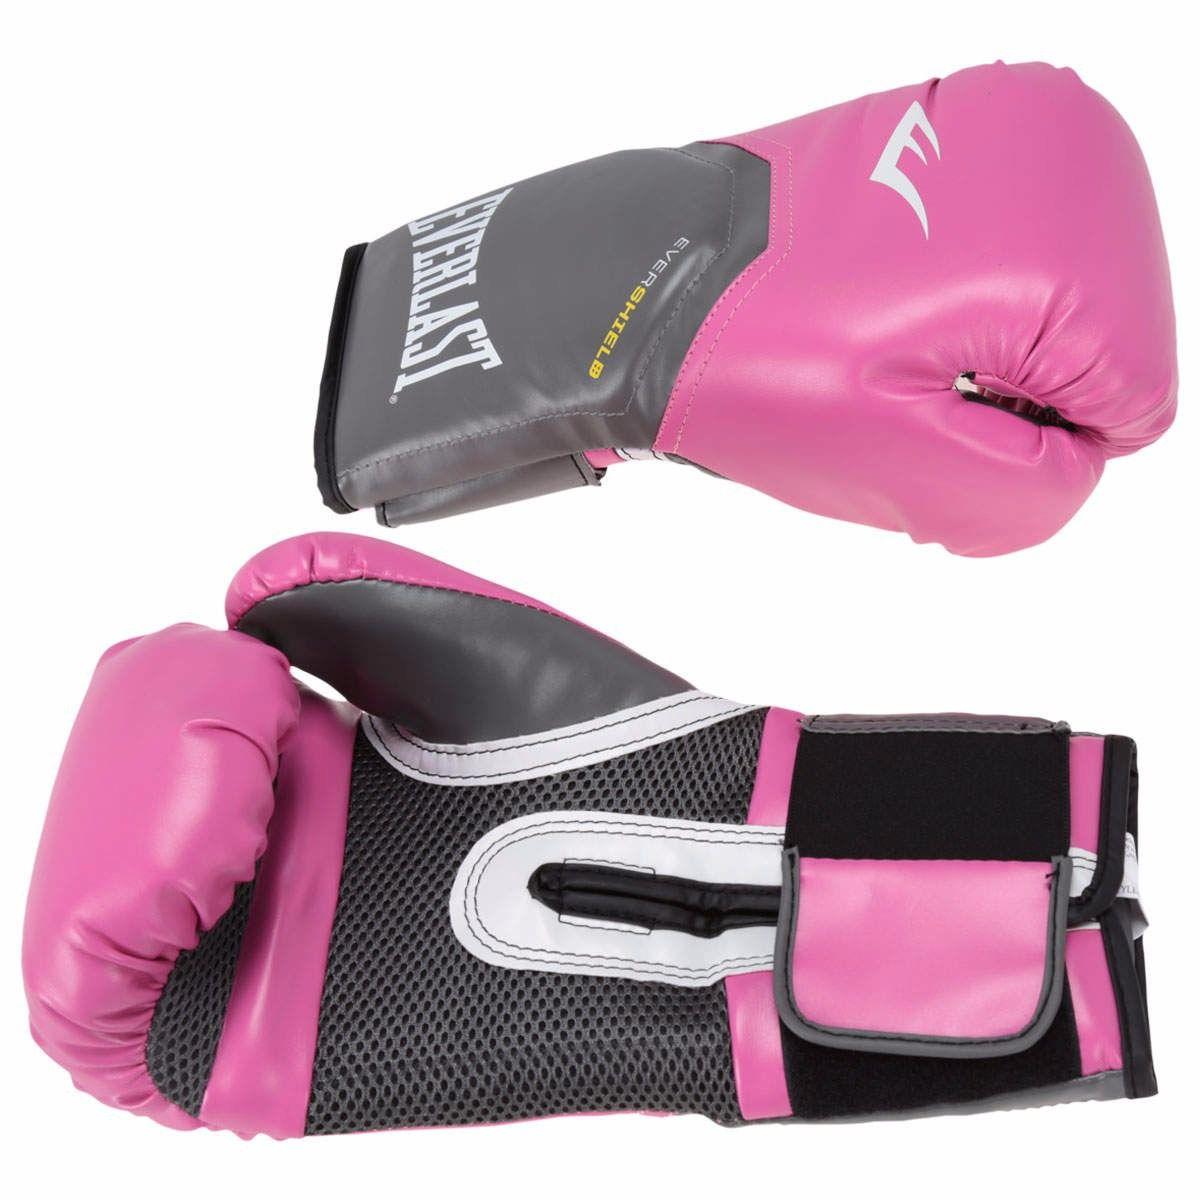 Luvas Boxe / Muay Thai - Elite  Evershield - Rosa - Everlast -  - Loja do Competidor